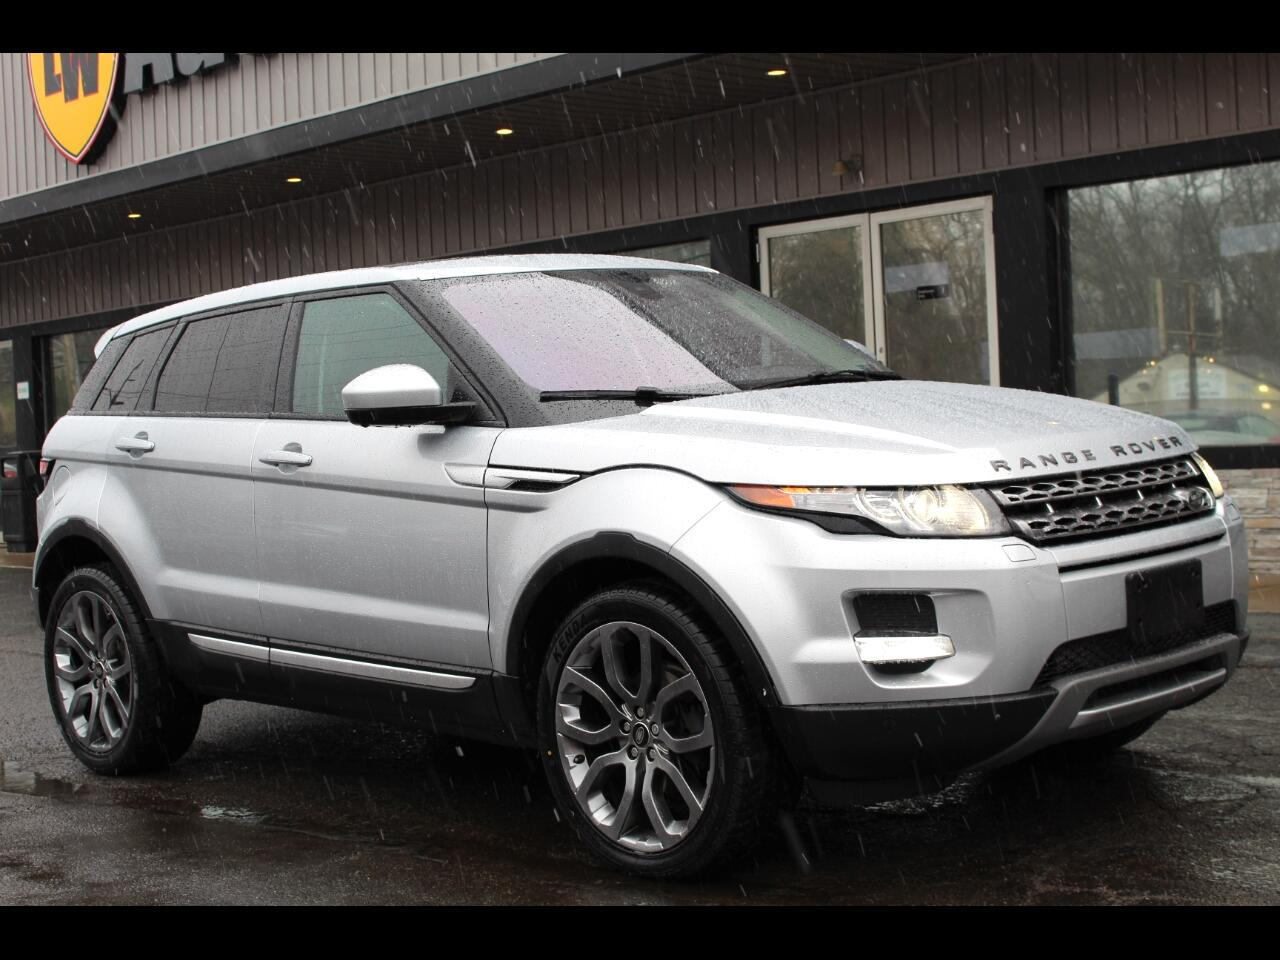 2014 Land Rover Range Rover Evoque Prestige Premium 5-Door